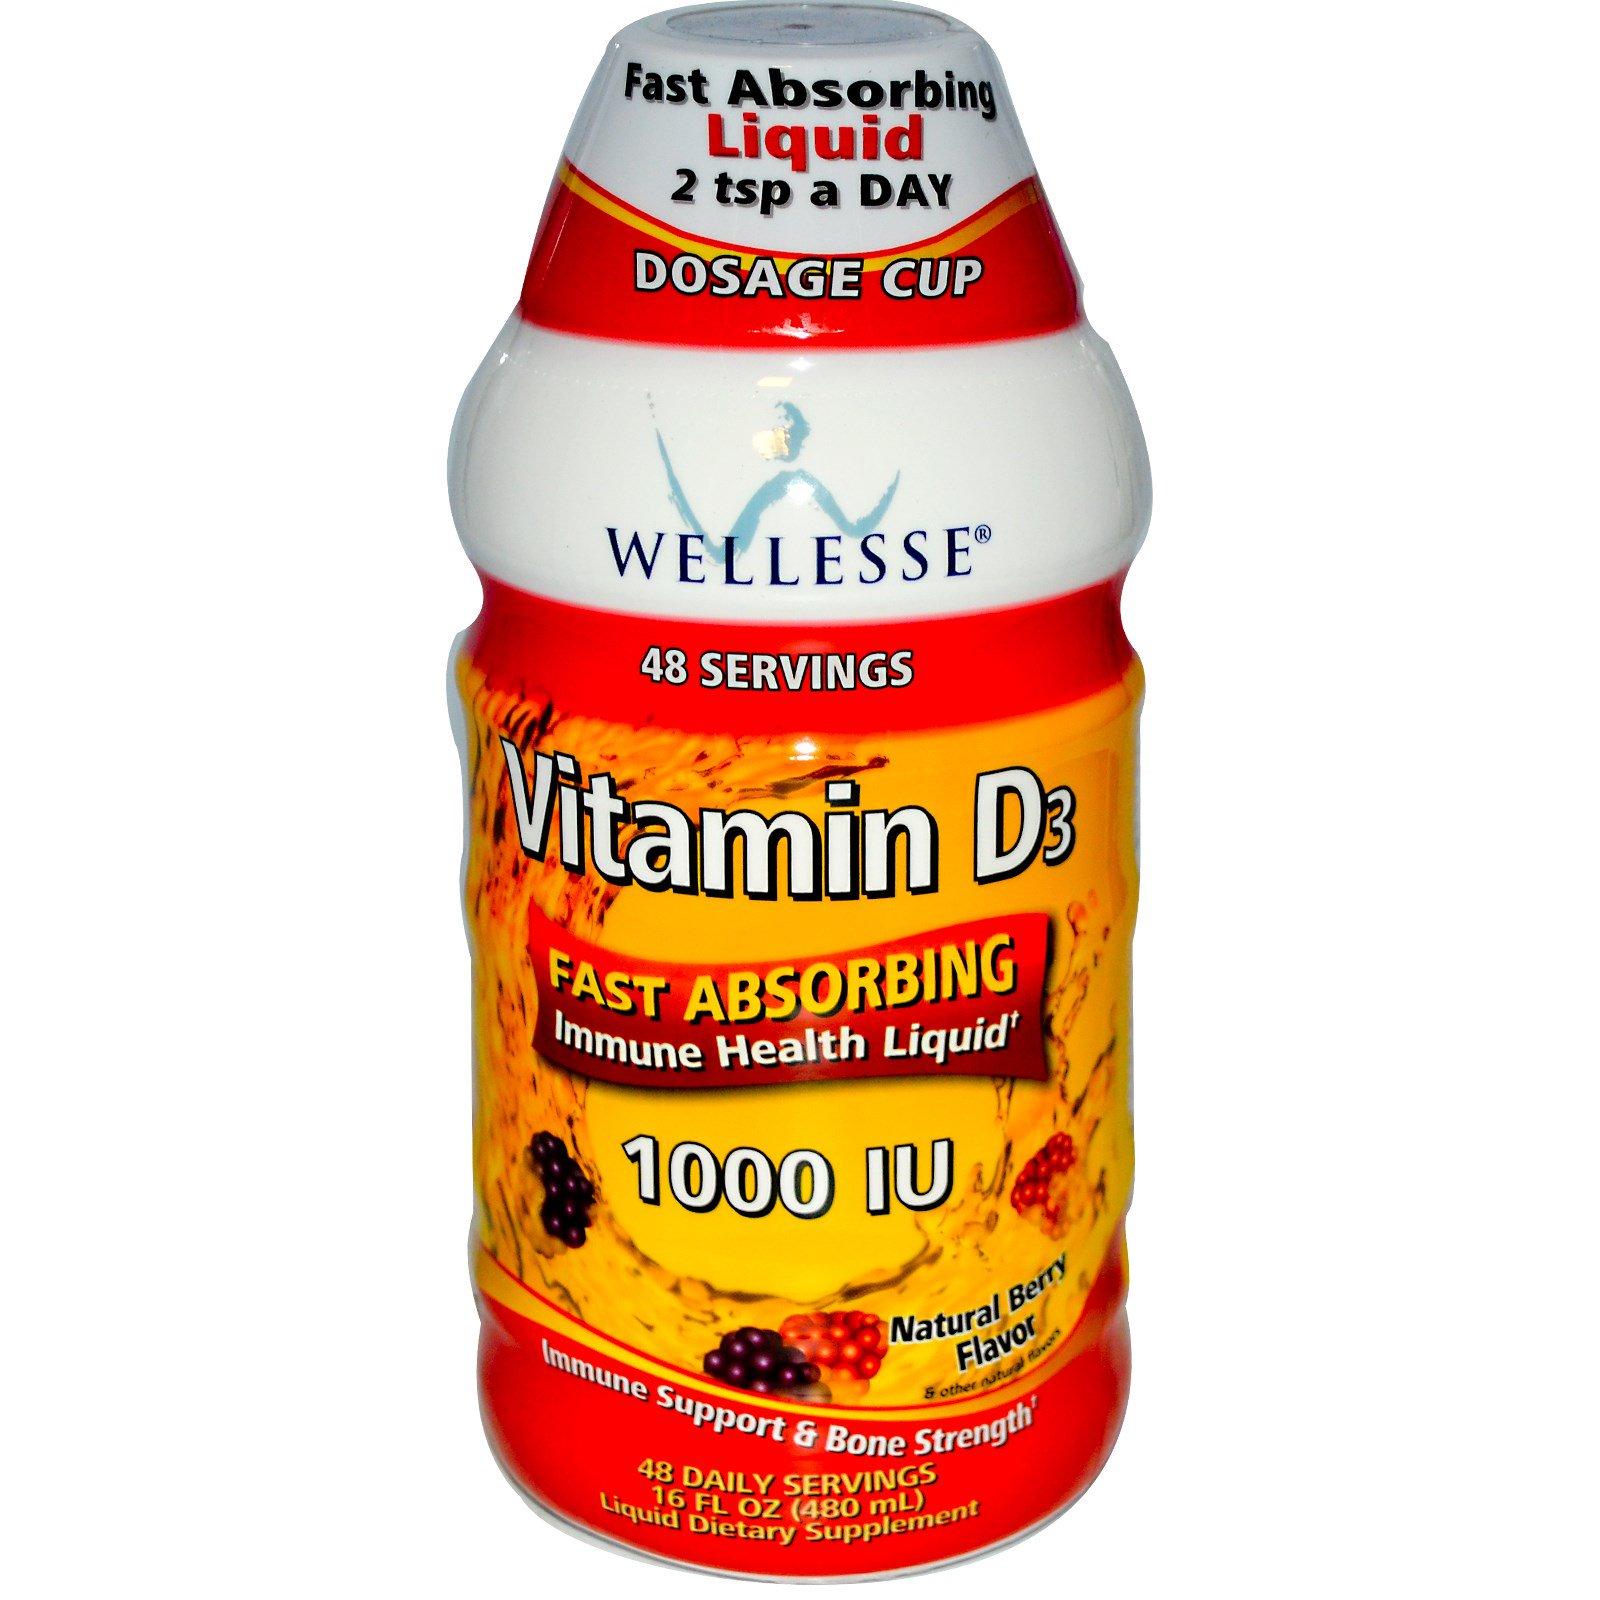 Wellesse Premium Liquid Supplements, Витамин D3, натуральный кус вишни, 1000 МЕ, 16 жидких унций (480 мл)